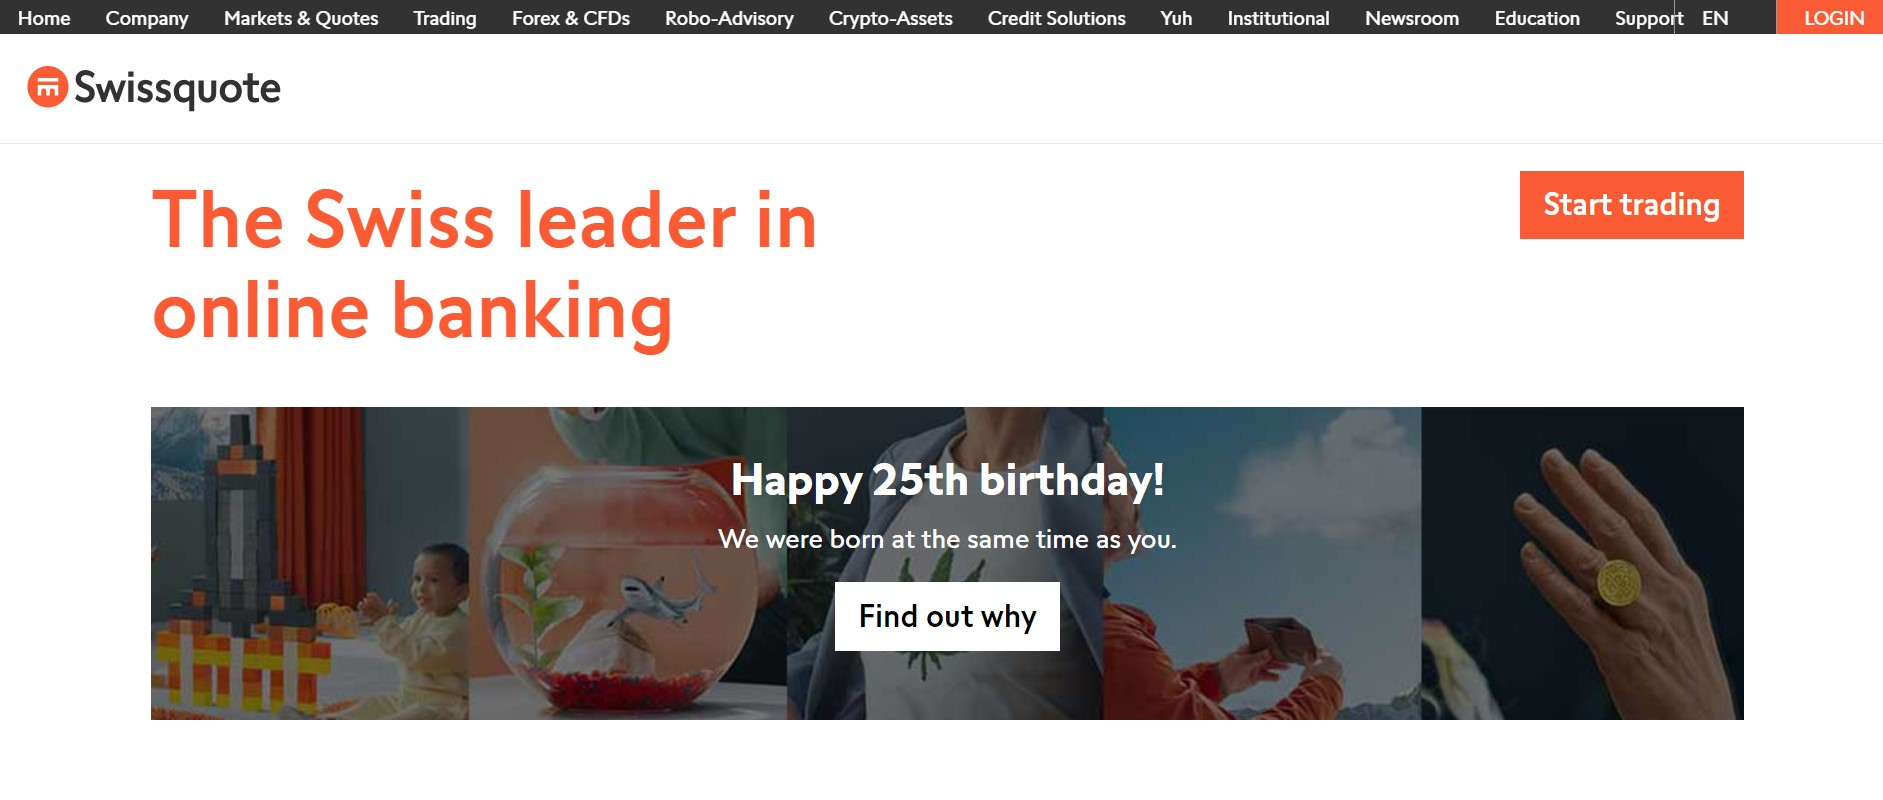 Swissquote website